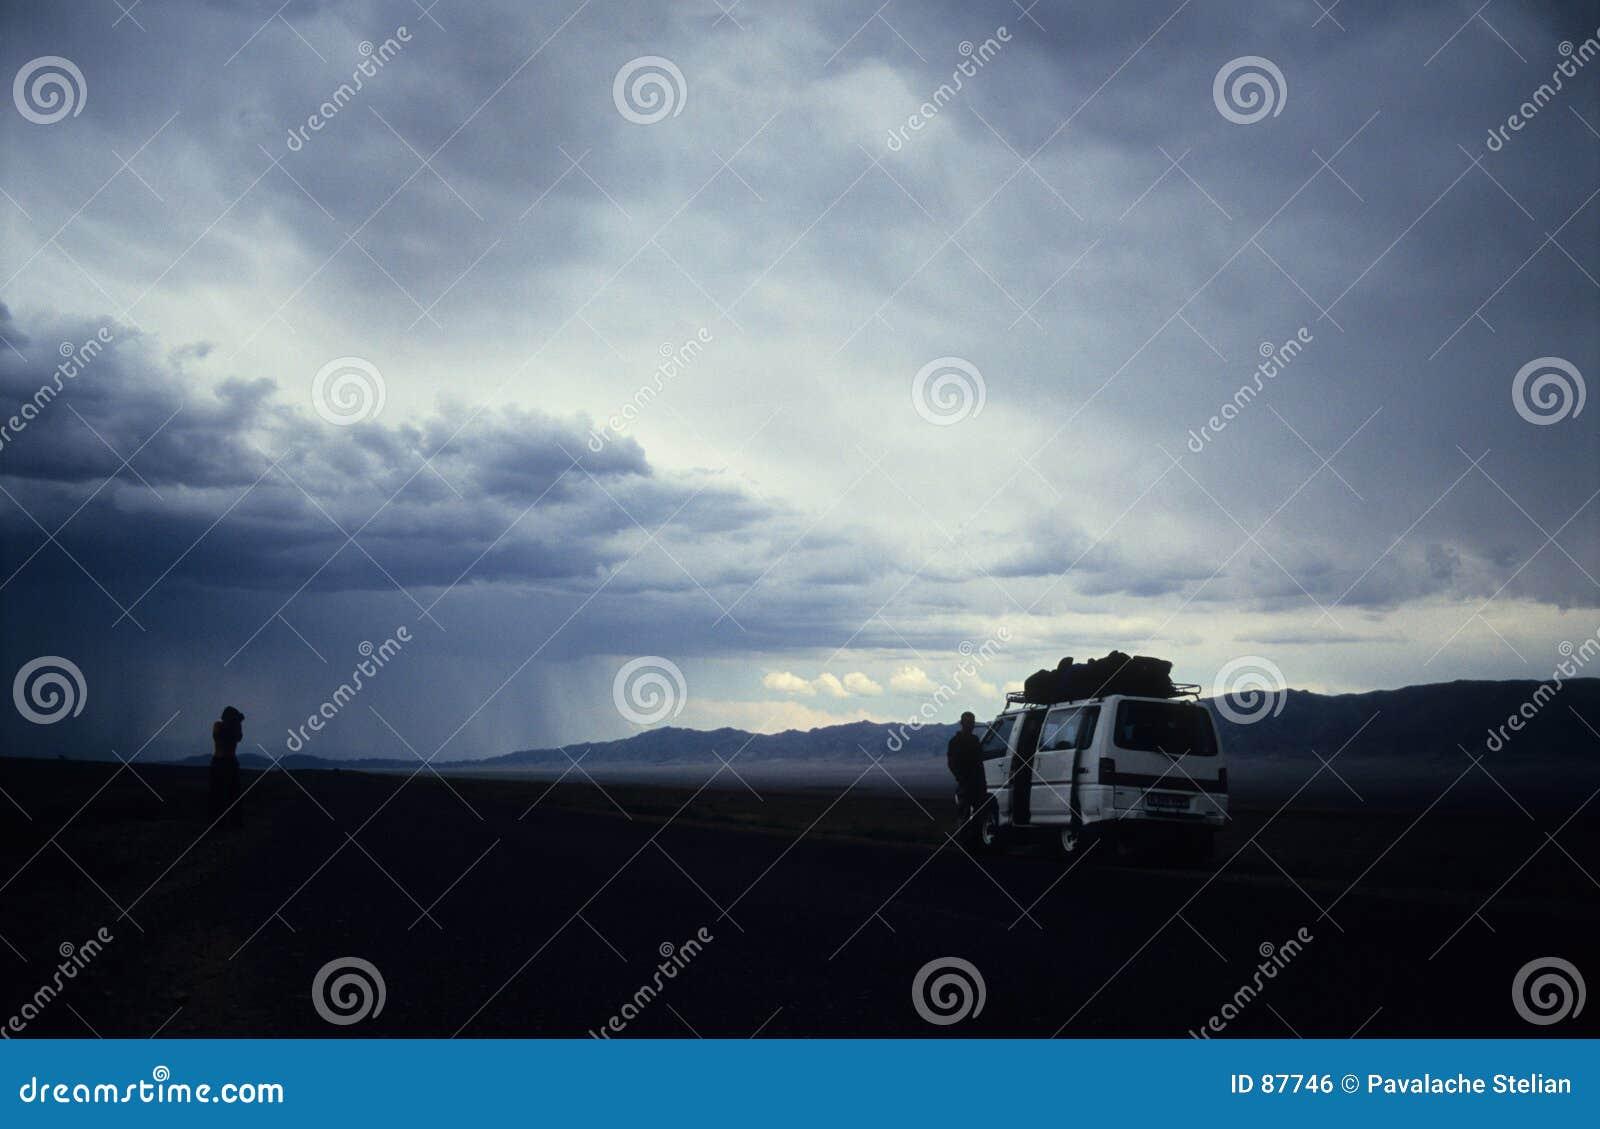 Wielka burza   kazachstan